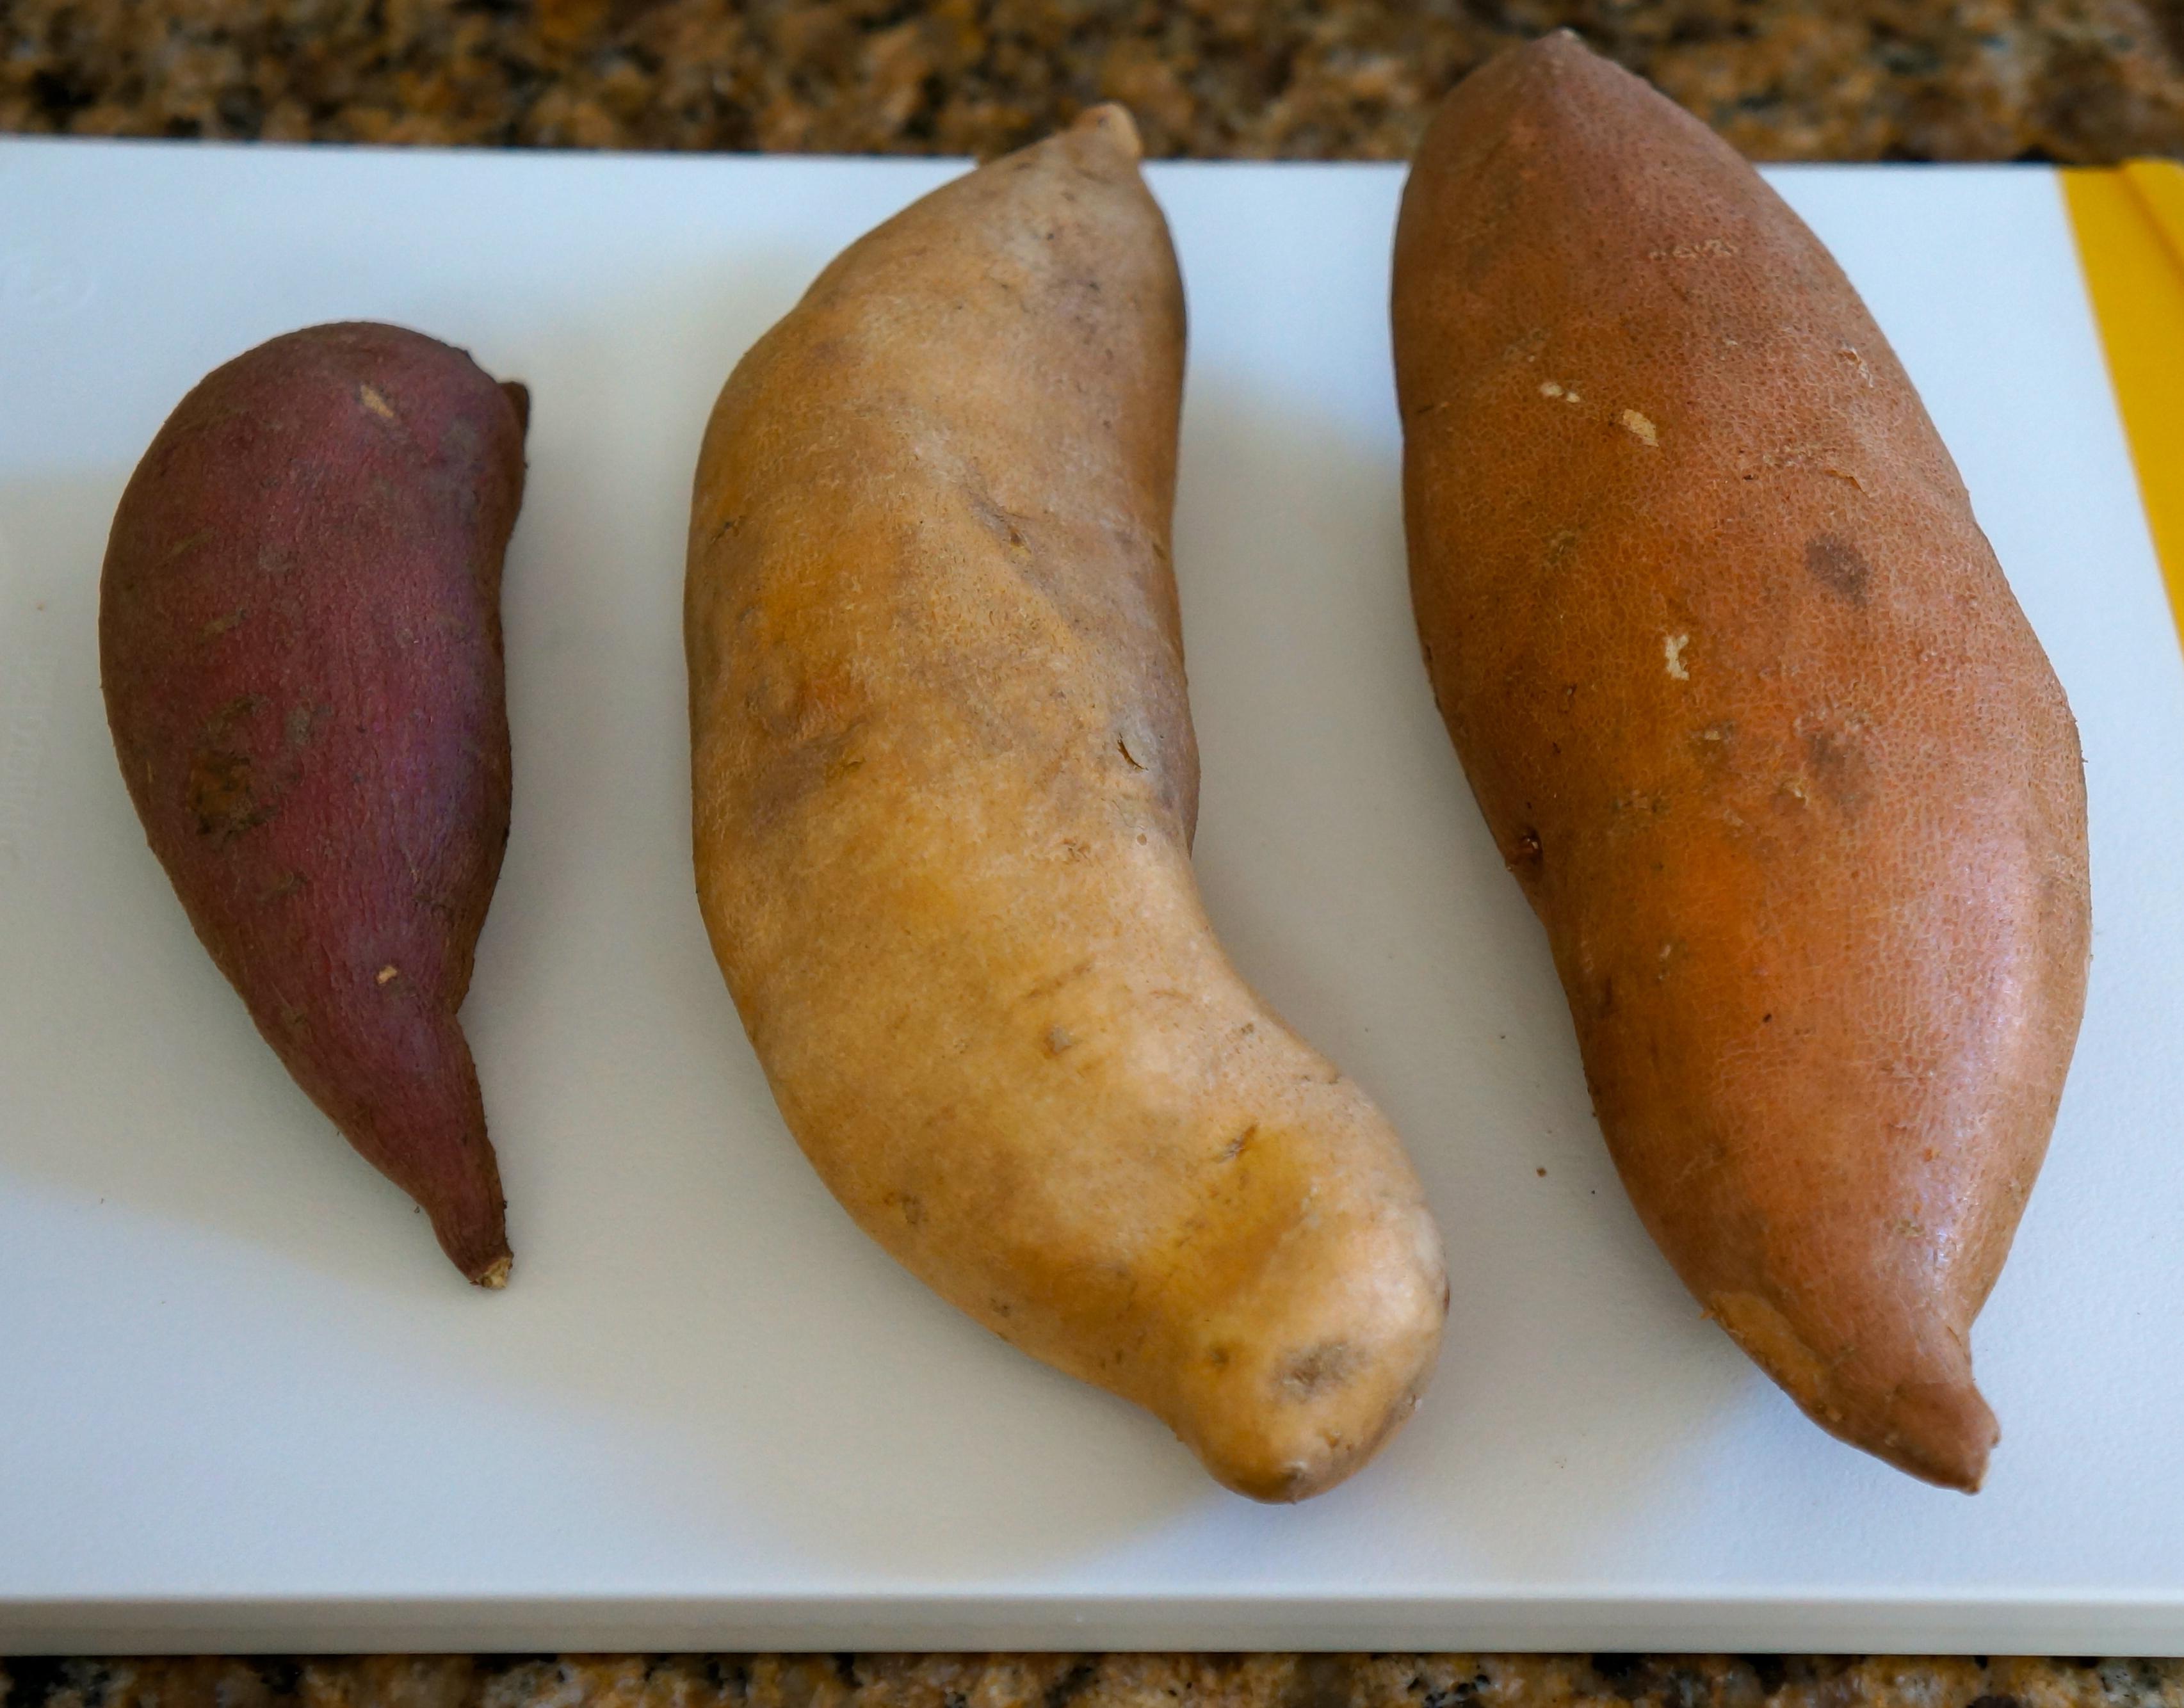 ... sweet potato, white-fleshed sweet potato, orange-fleshed sweet potato